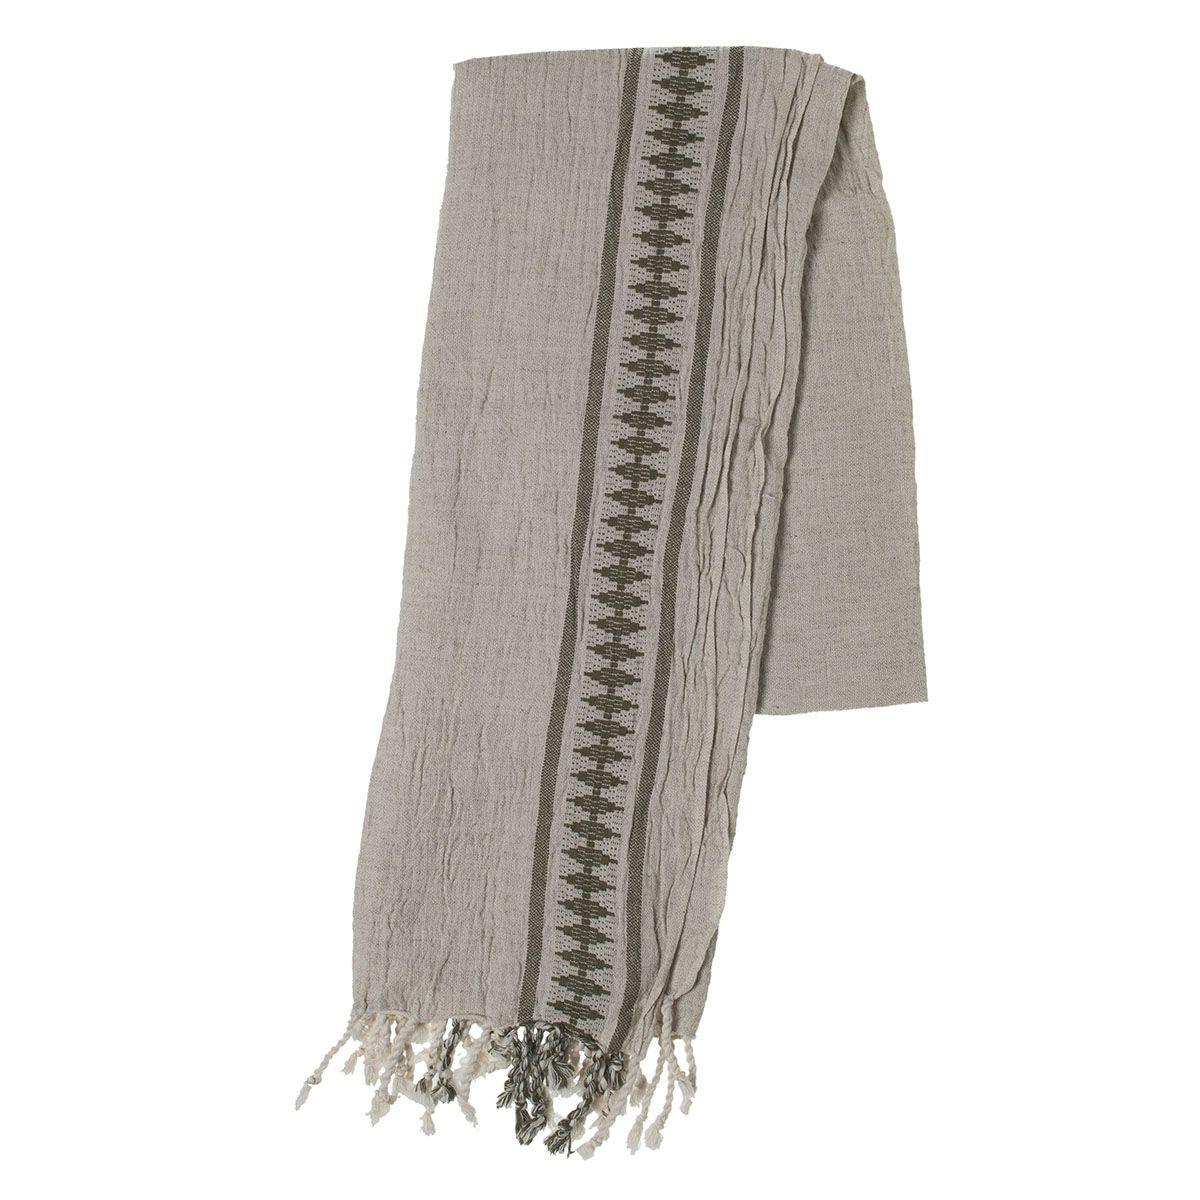 Peshtemal Antique - Khaki Stripe